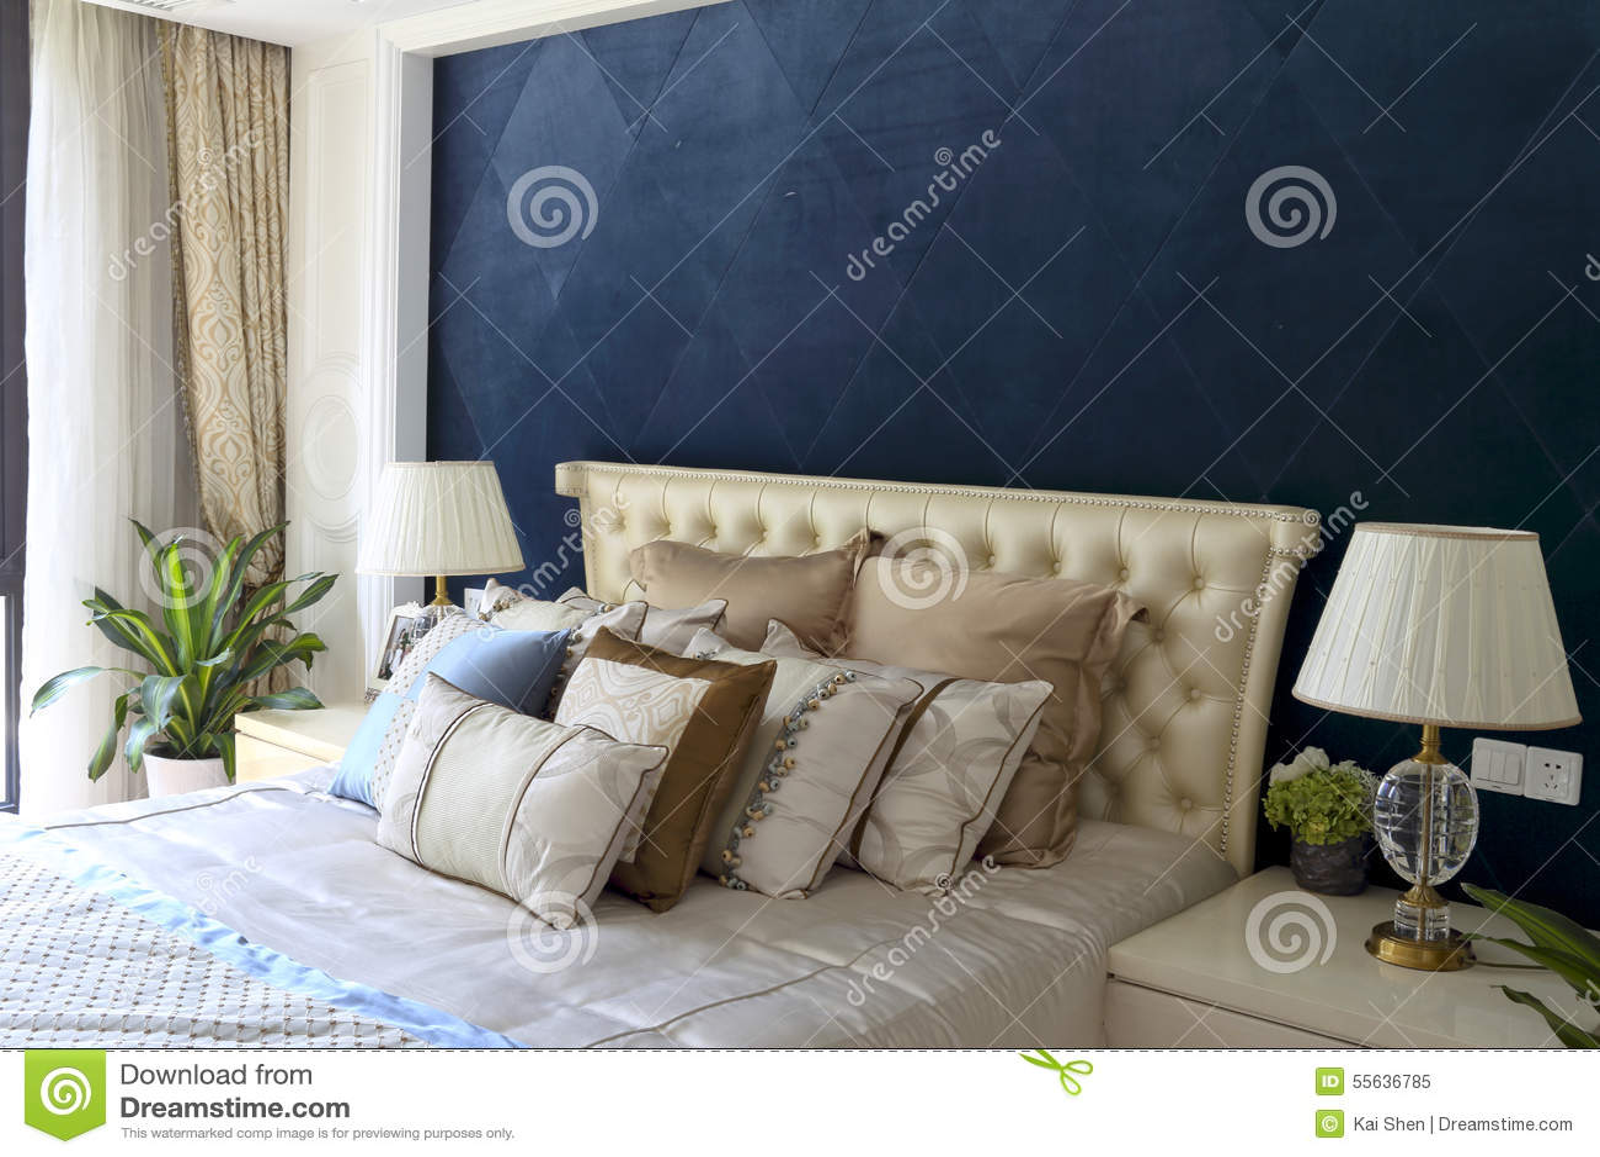 diamond blue curtain wall of the bedroom stock photo  image, Bedroom decor